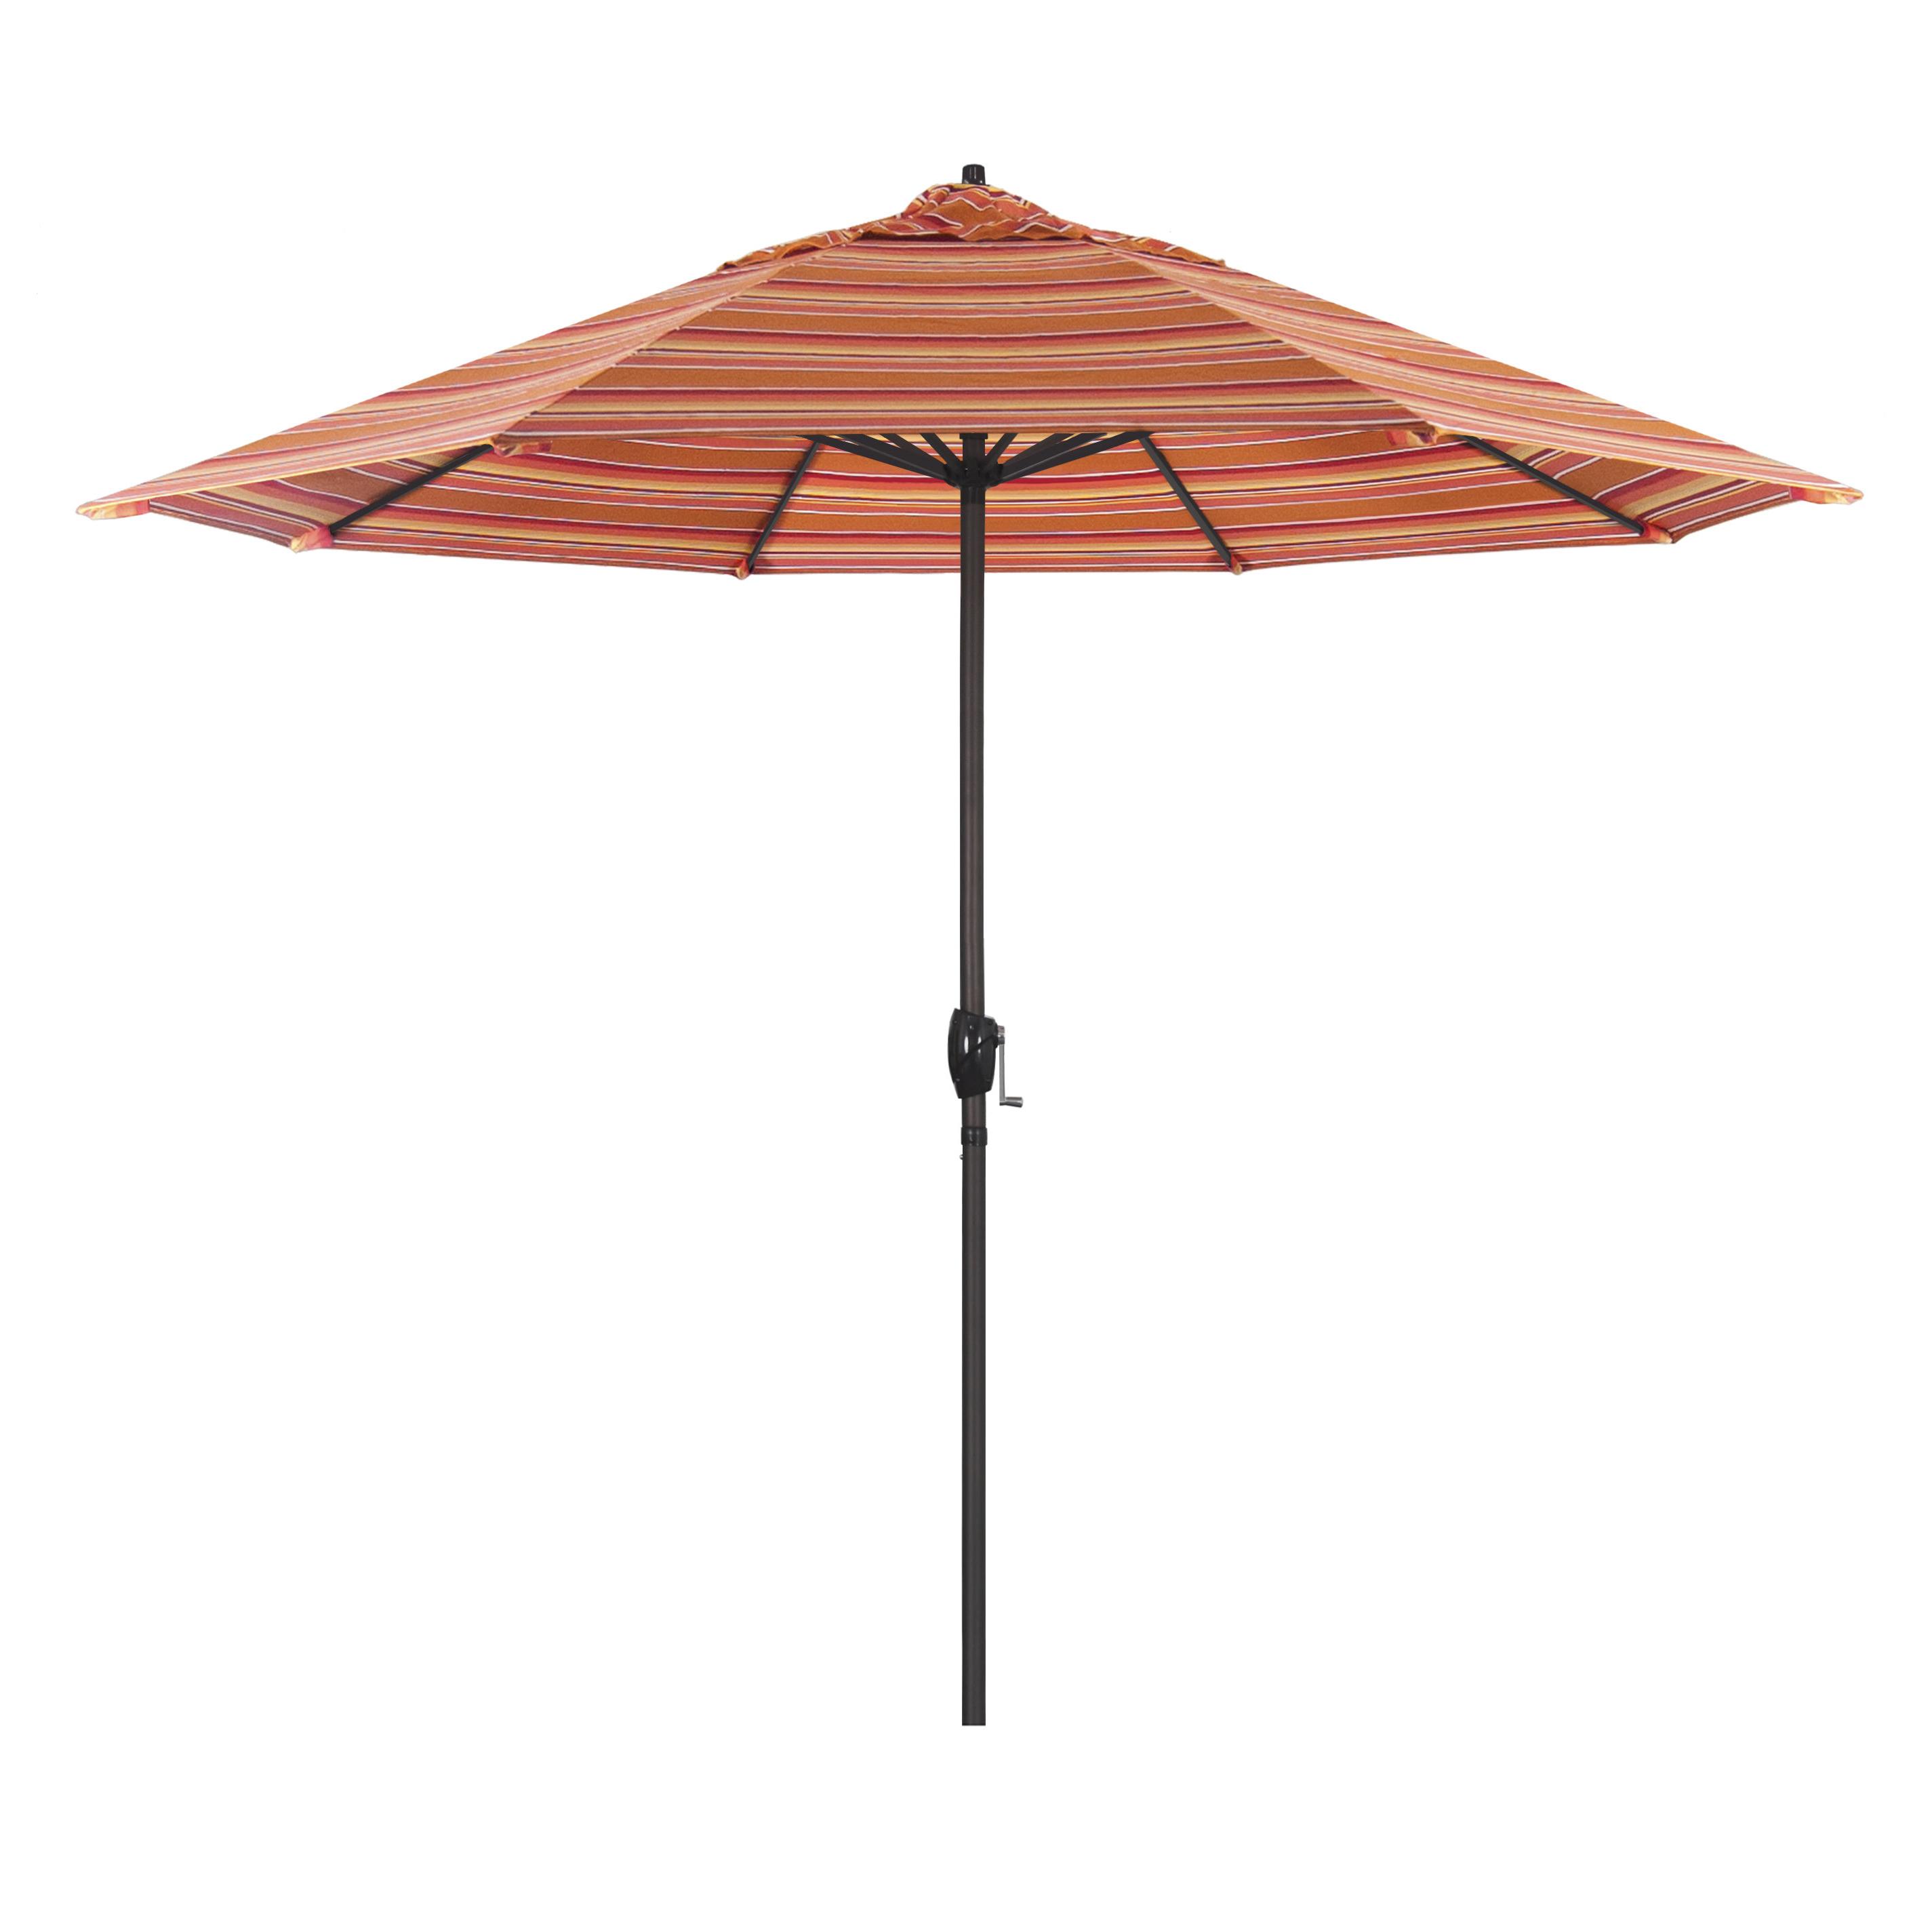 Best And Newest Cardine 9' Market Sunbrella Umbrella For Cardine Market Umbrellas (View 4 of 20)